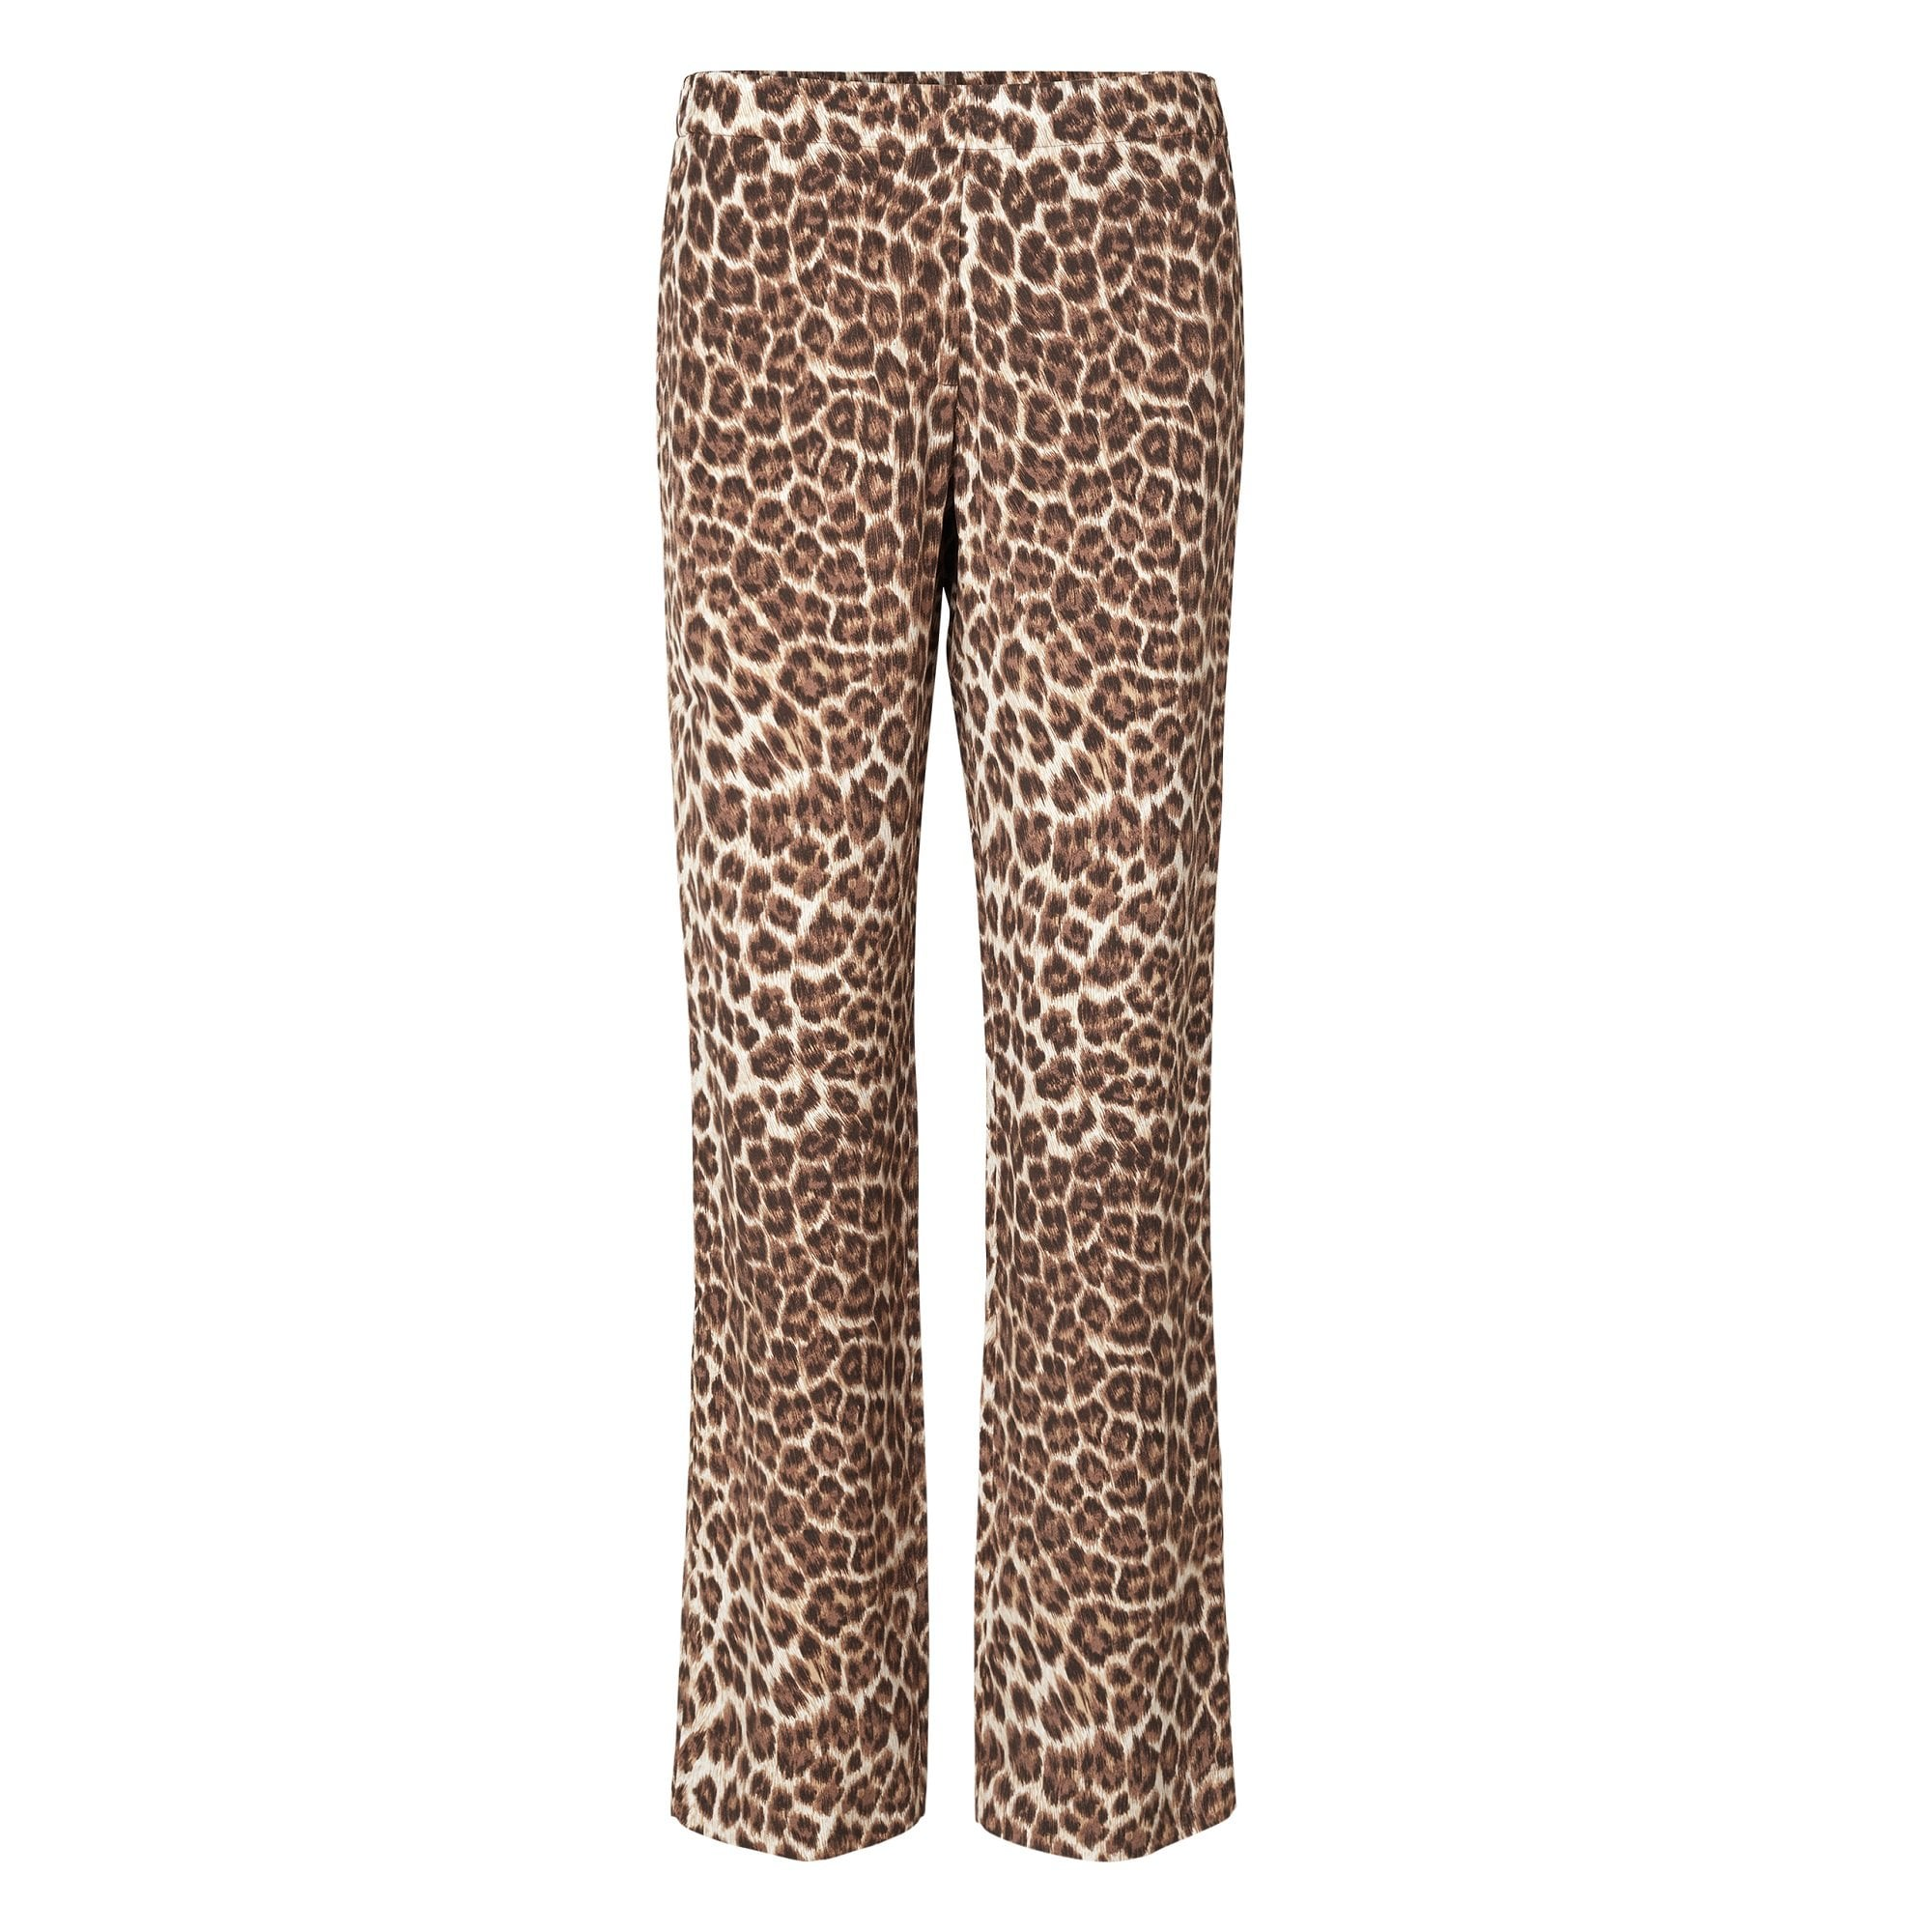 Hoys Straight Leg Pants in Leopard